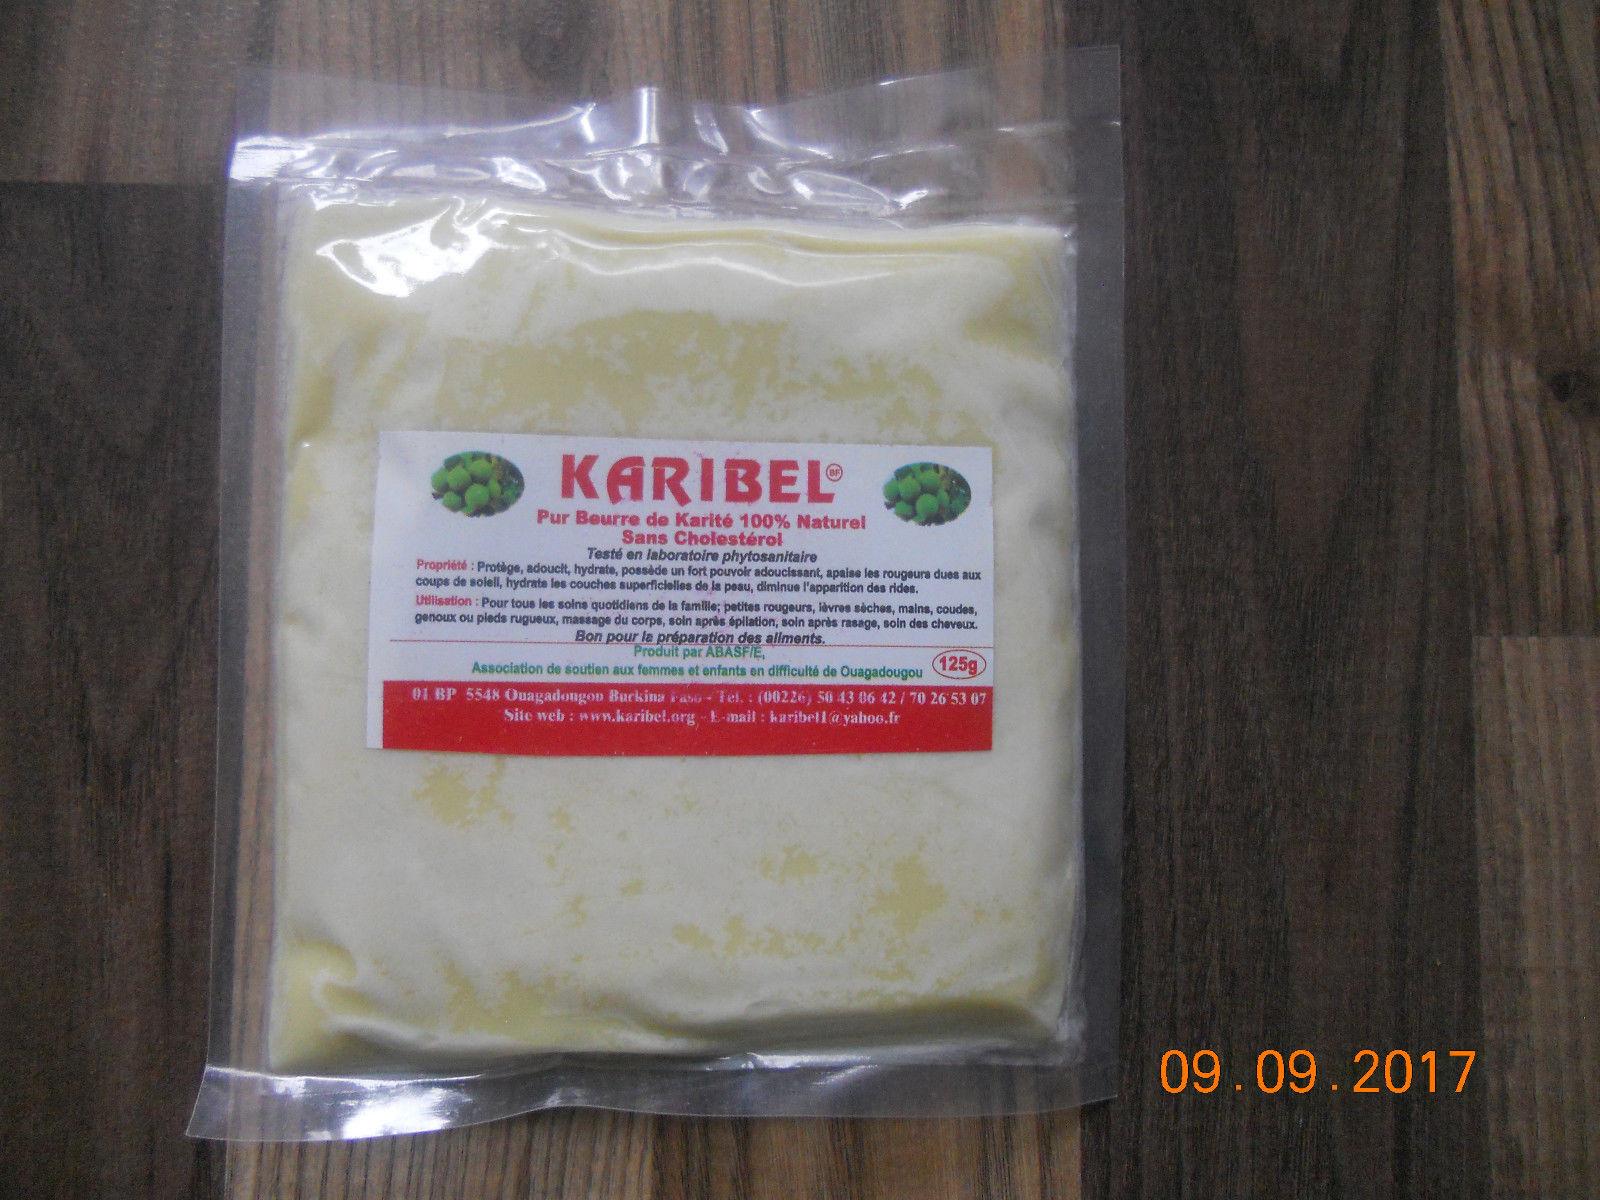 125g Sheabutter, beurre de karité 100% natürlich aus Burkina Faso. Unbehandelt !